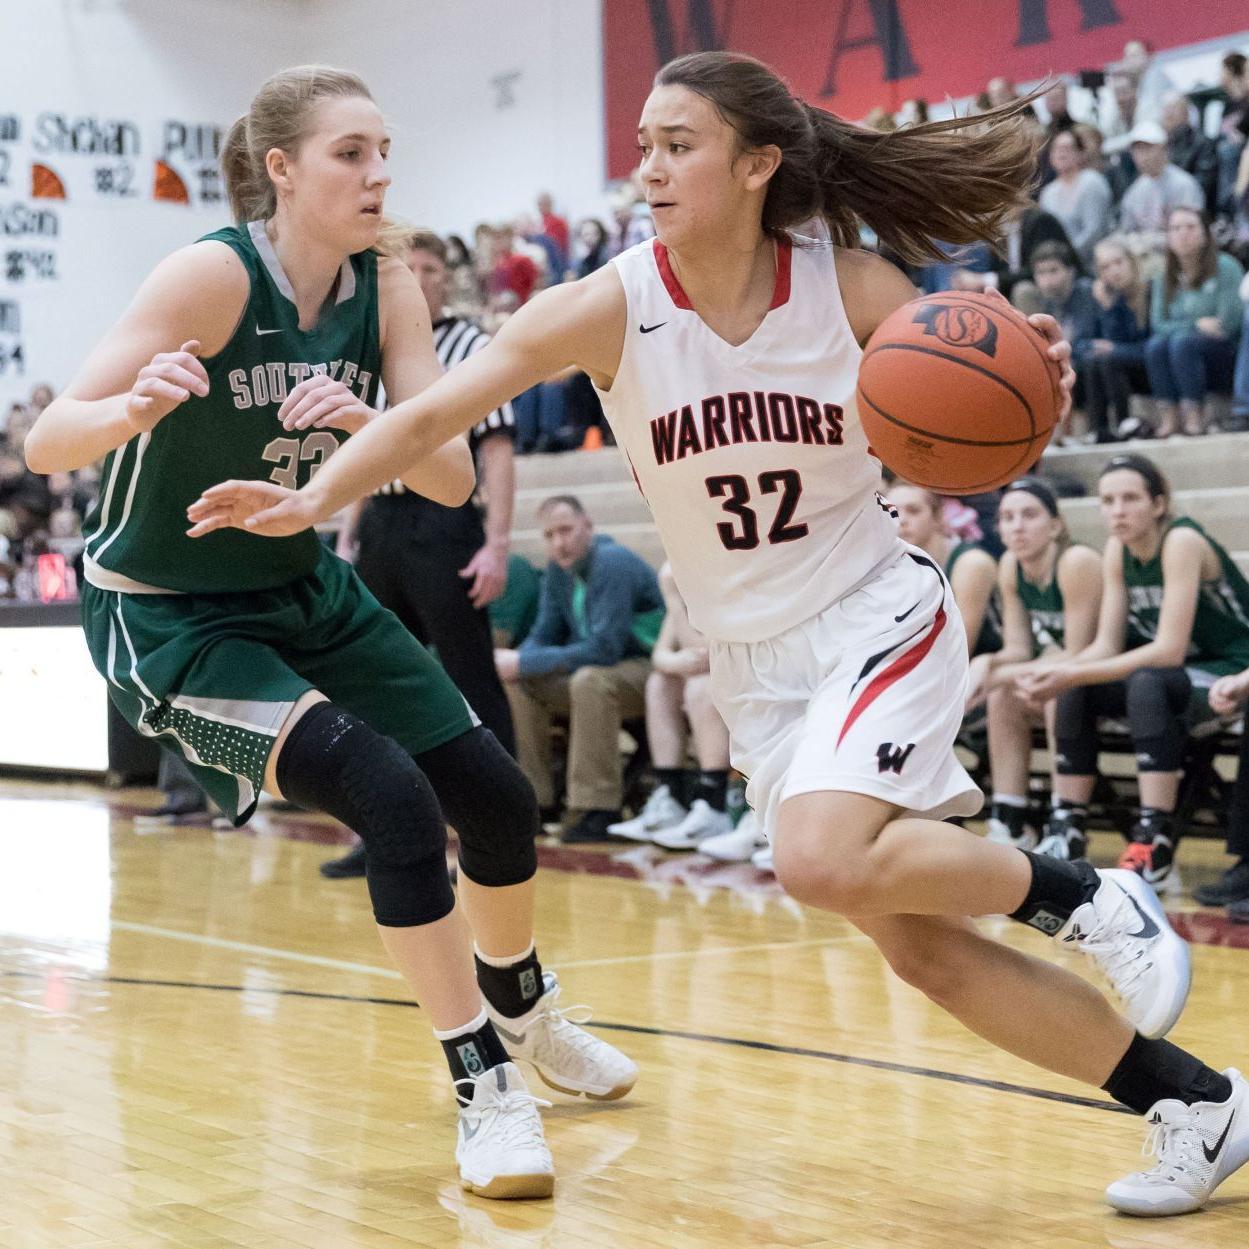 2017 AAU girls basketball rosters, schedules | Girls basketball